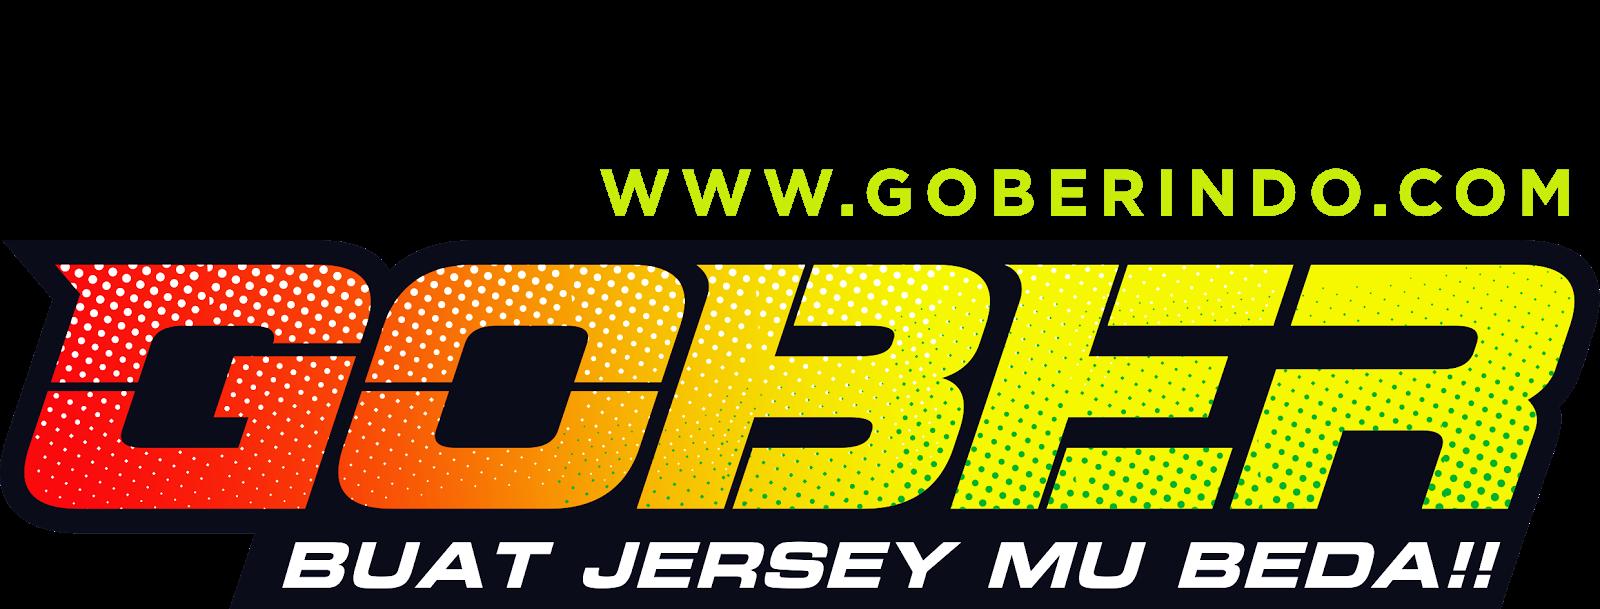 Gober Jersey